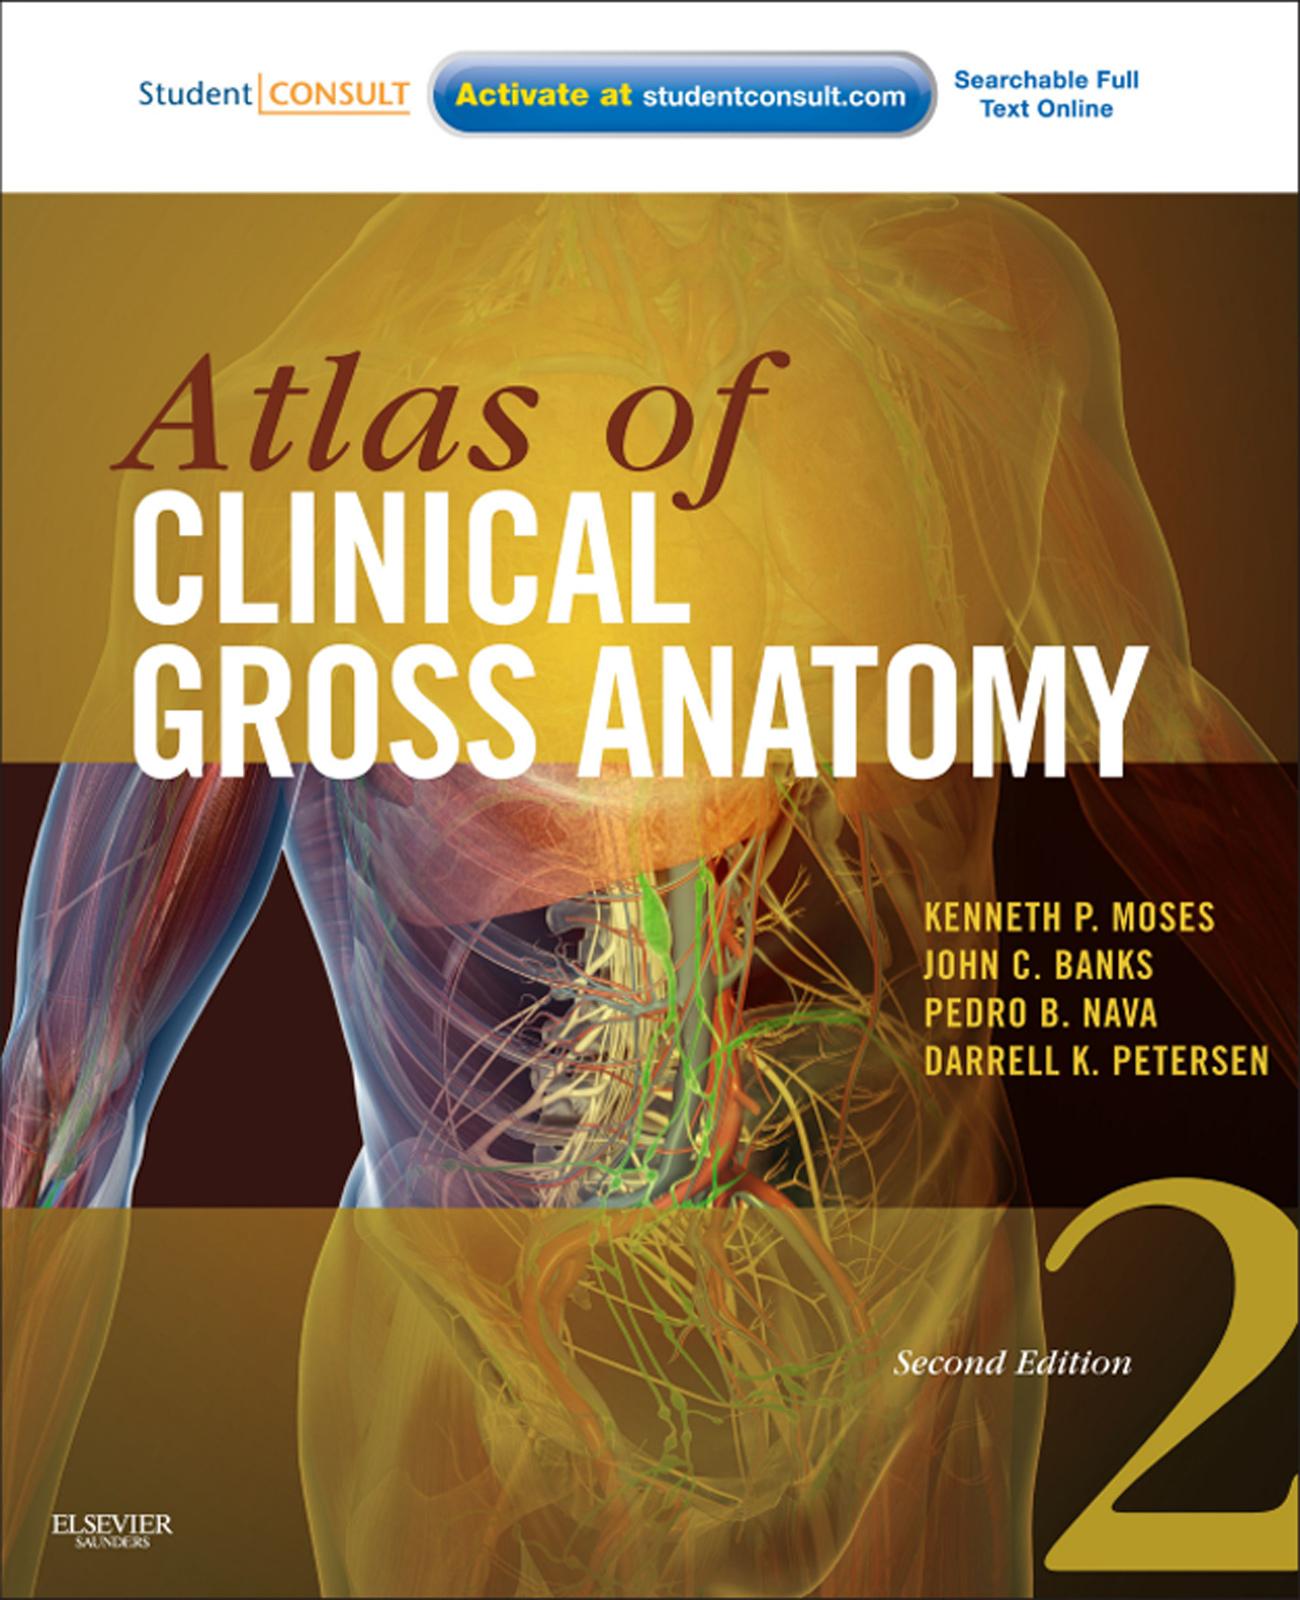 Atlas of Clinical Gross Anatomy   R2 Digital Library